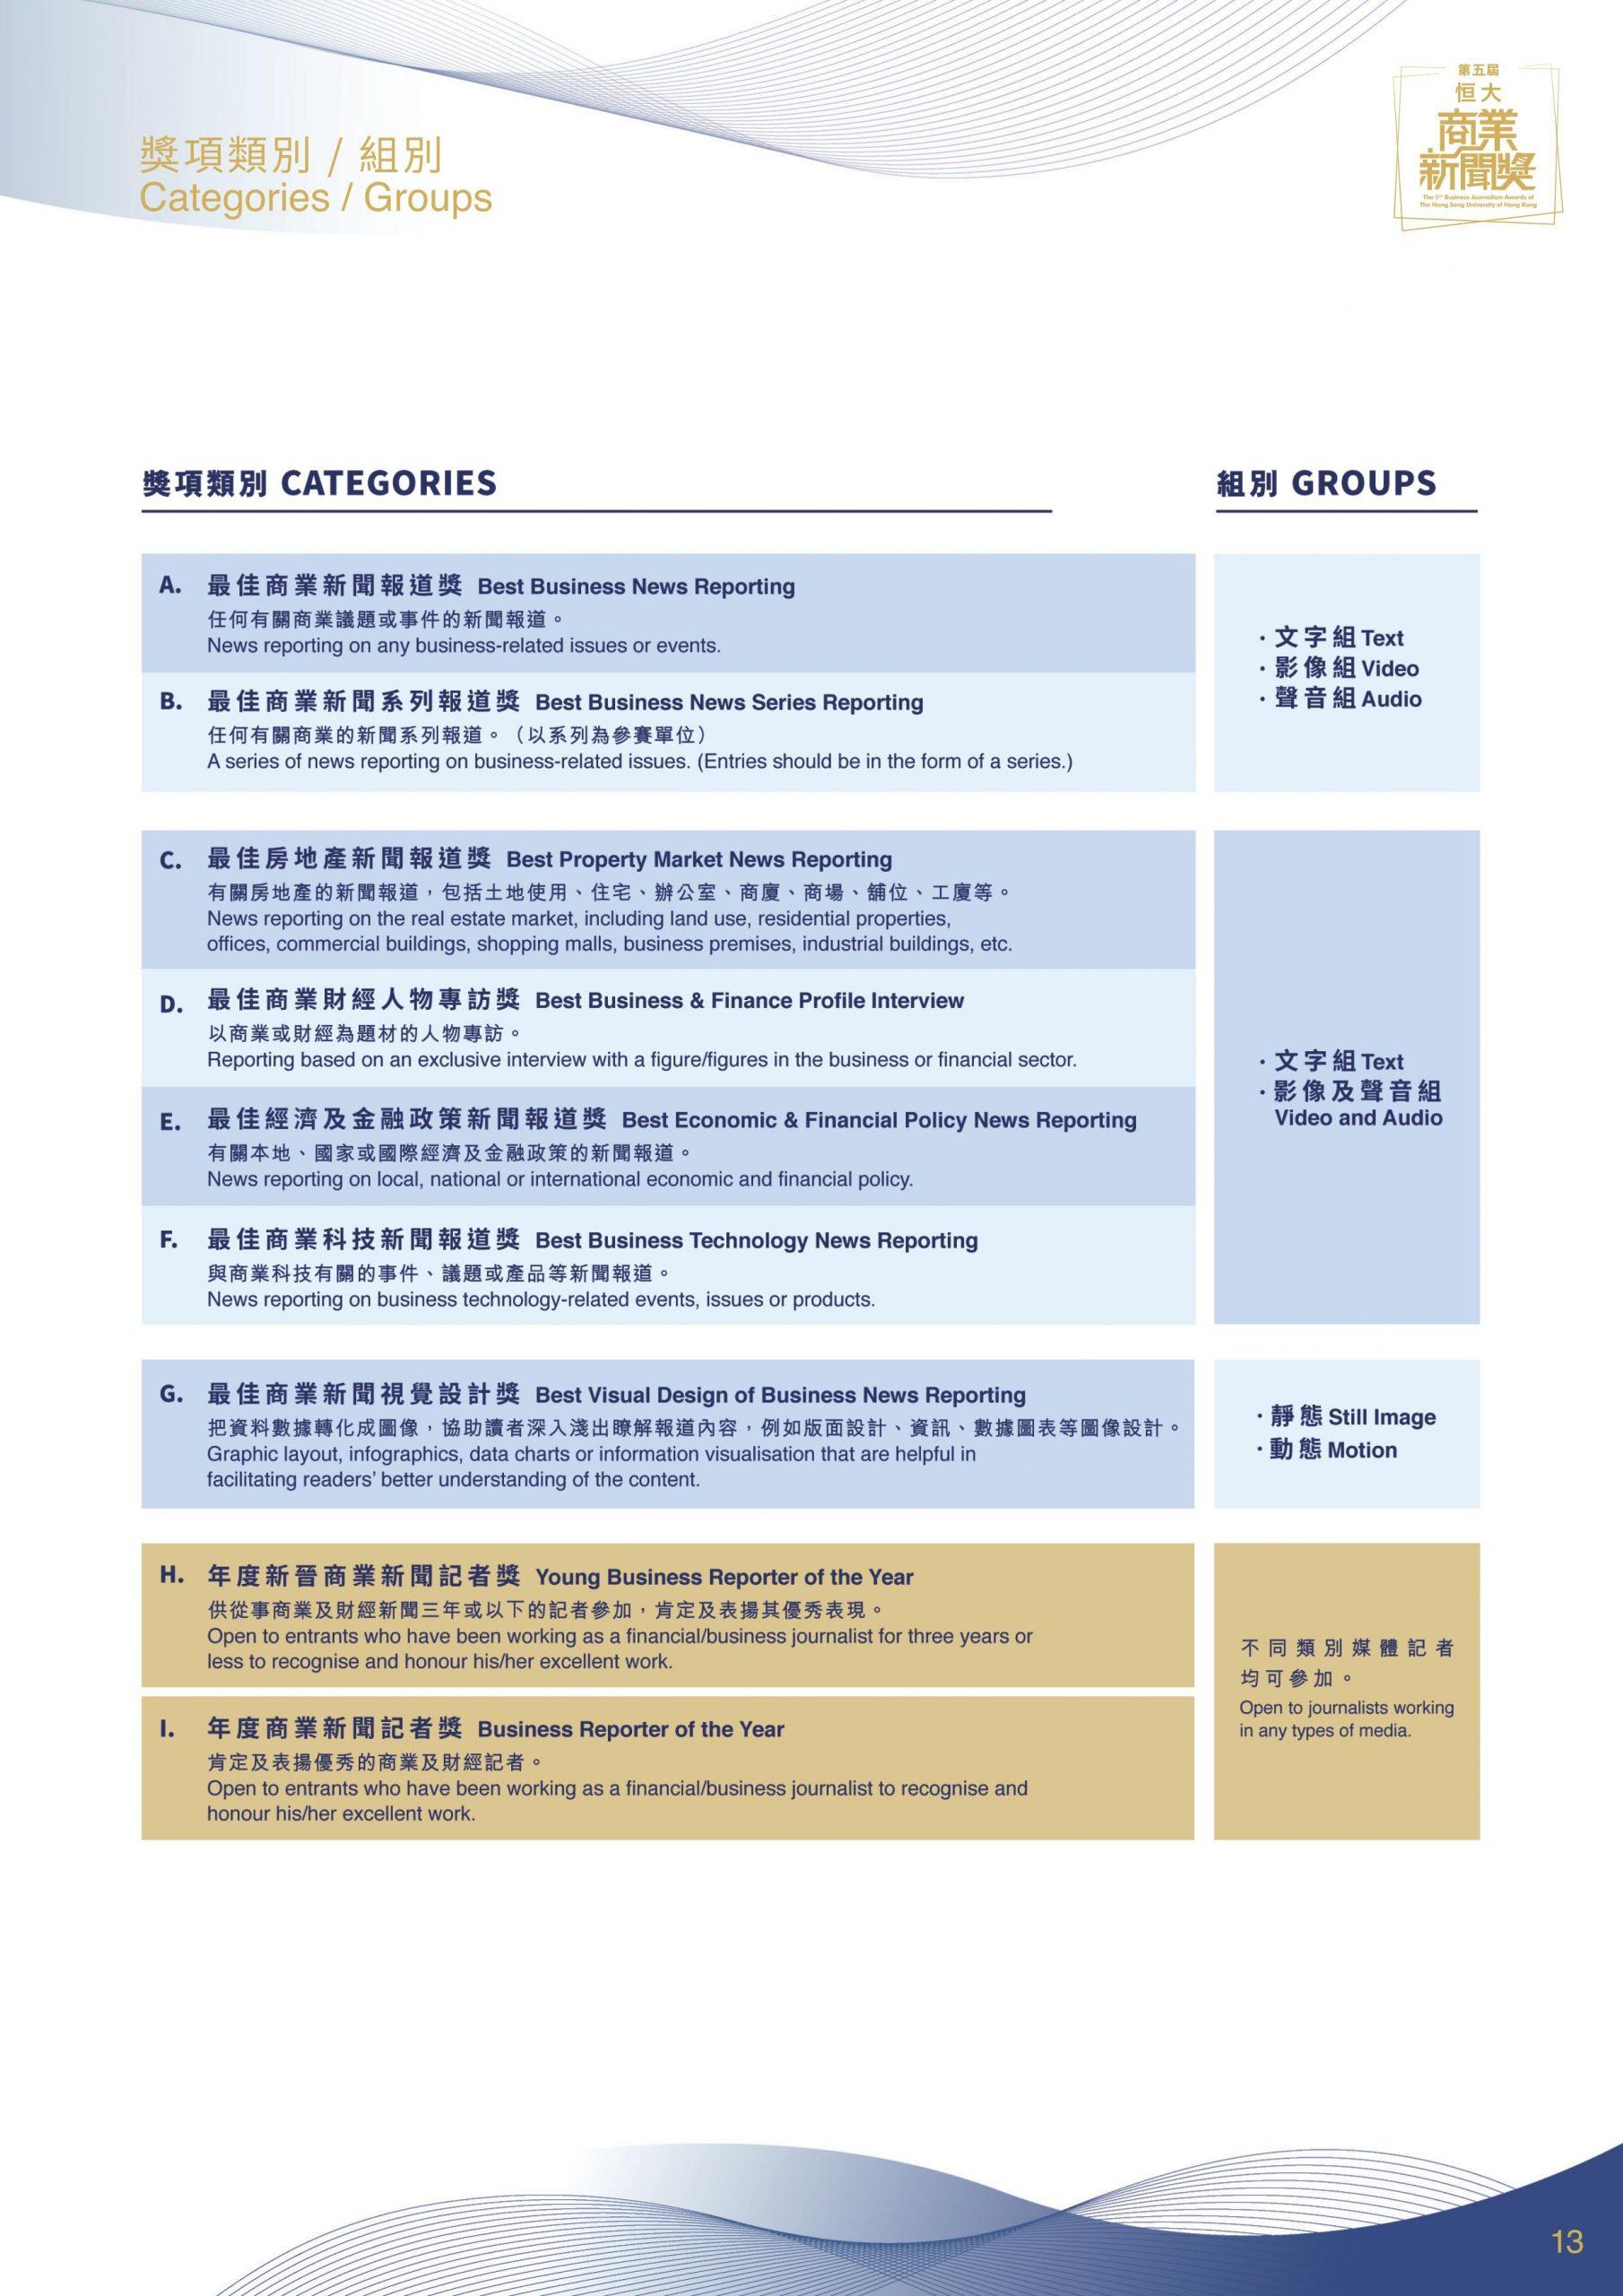 [:hk]第五屆恒大商業新聞獎 – 獎項類別/組別[:en]THE 5TH BUSINESS JOURNALISM AWARDS OF HSUHK – AWARDS CATEGORIES/GROUPS[:]